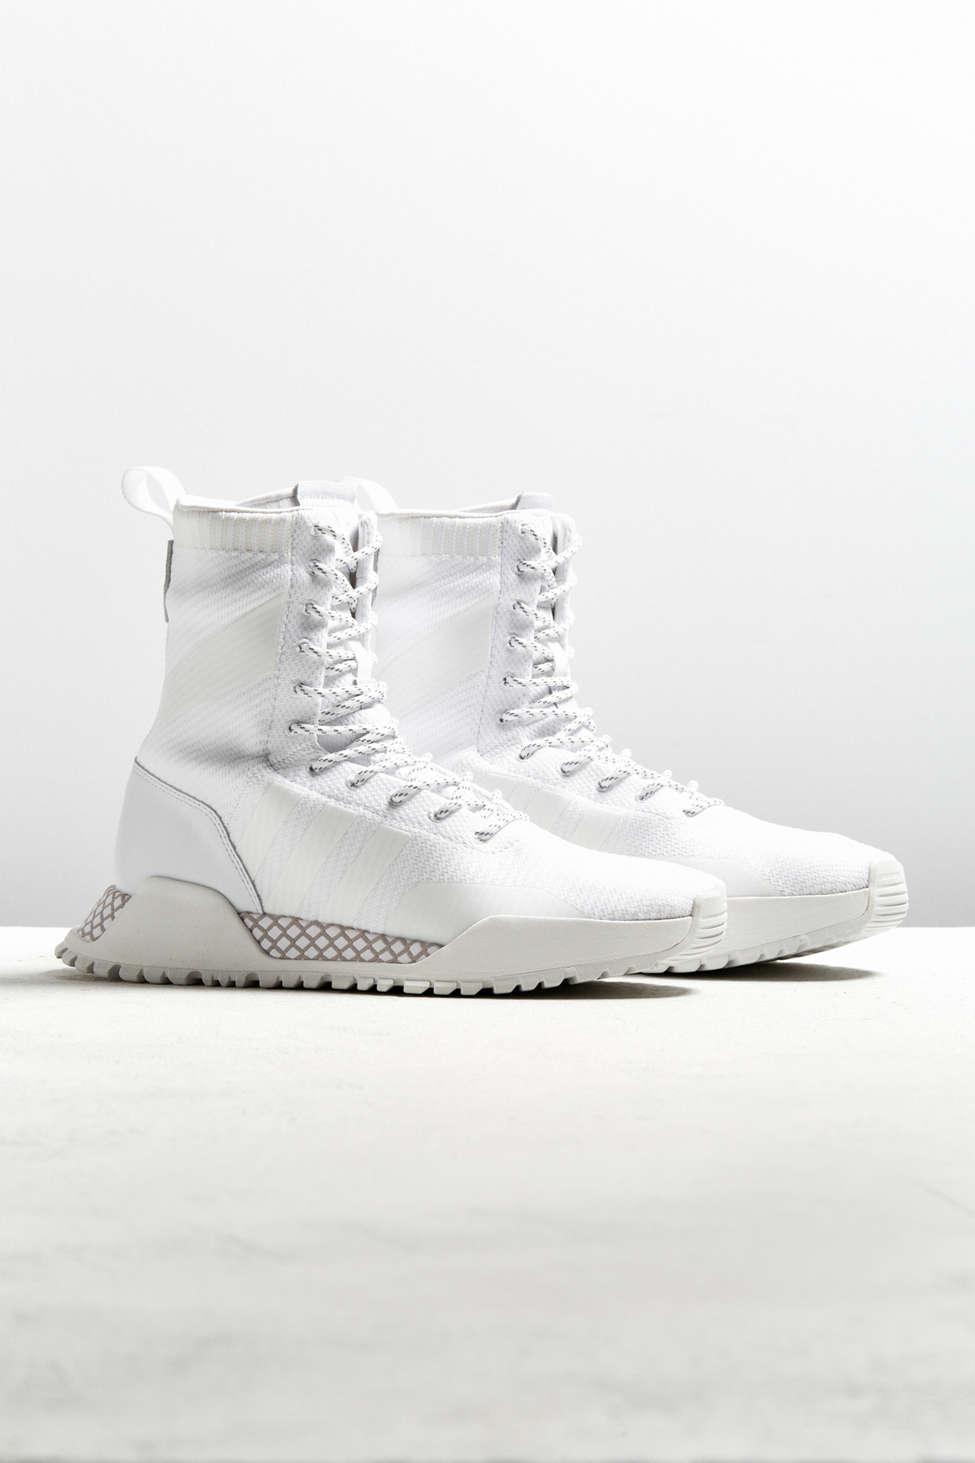 adidas af primeknit sneakerboot urban outfitters